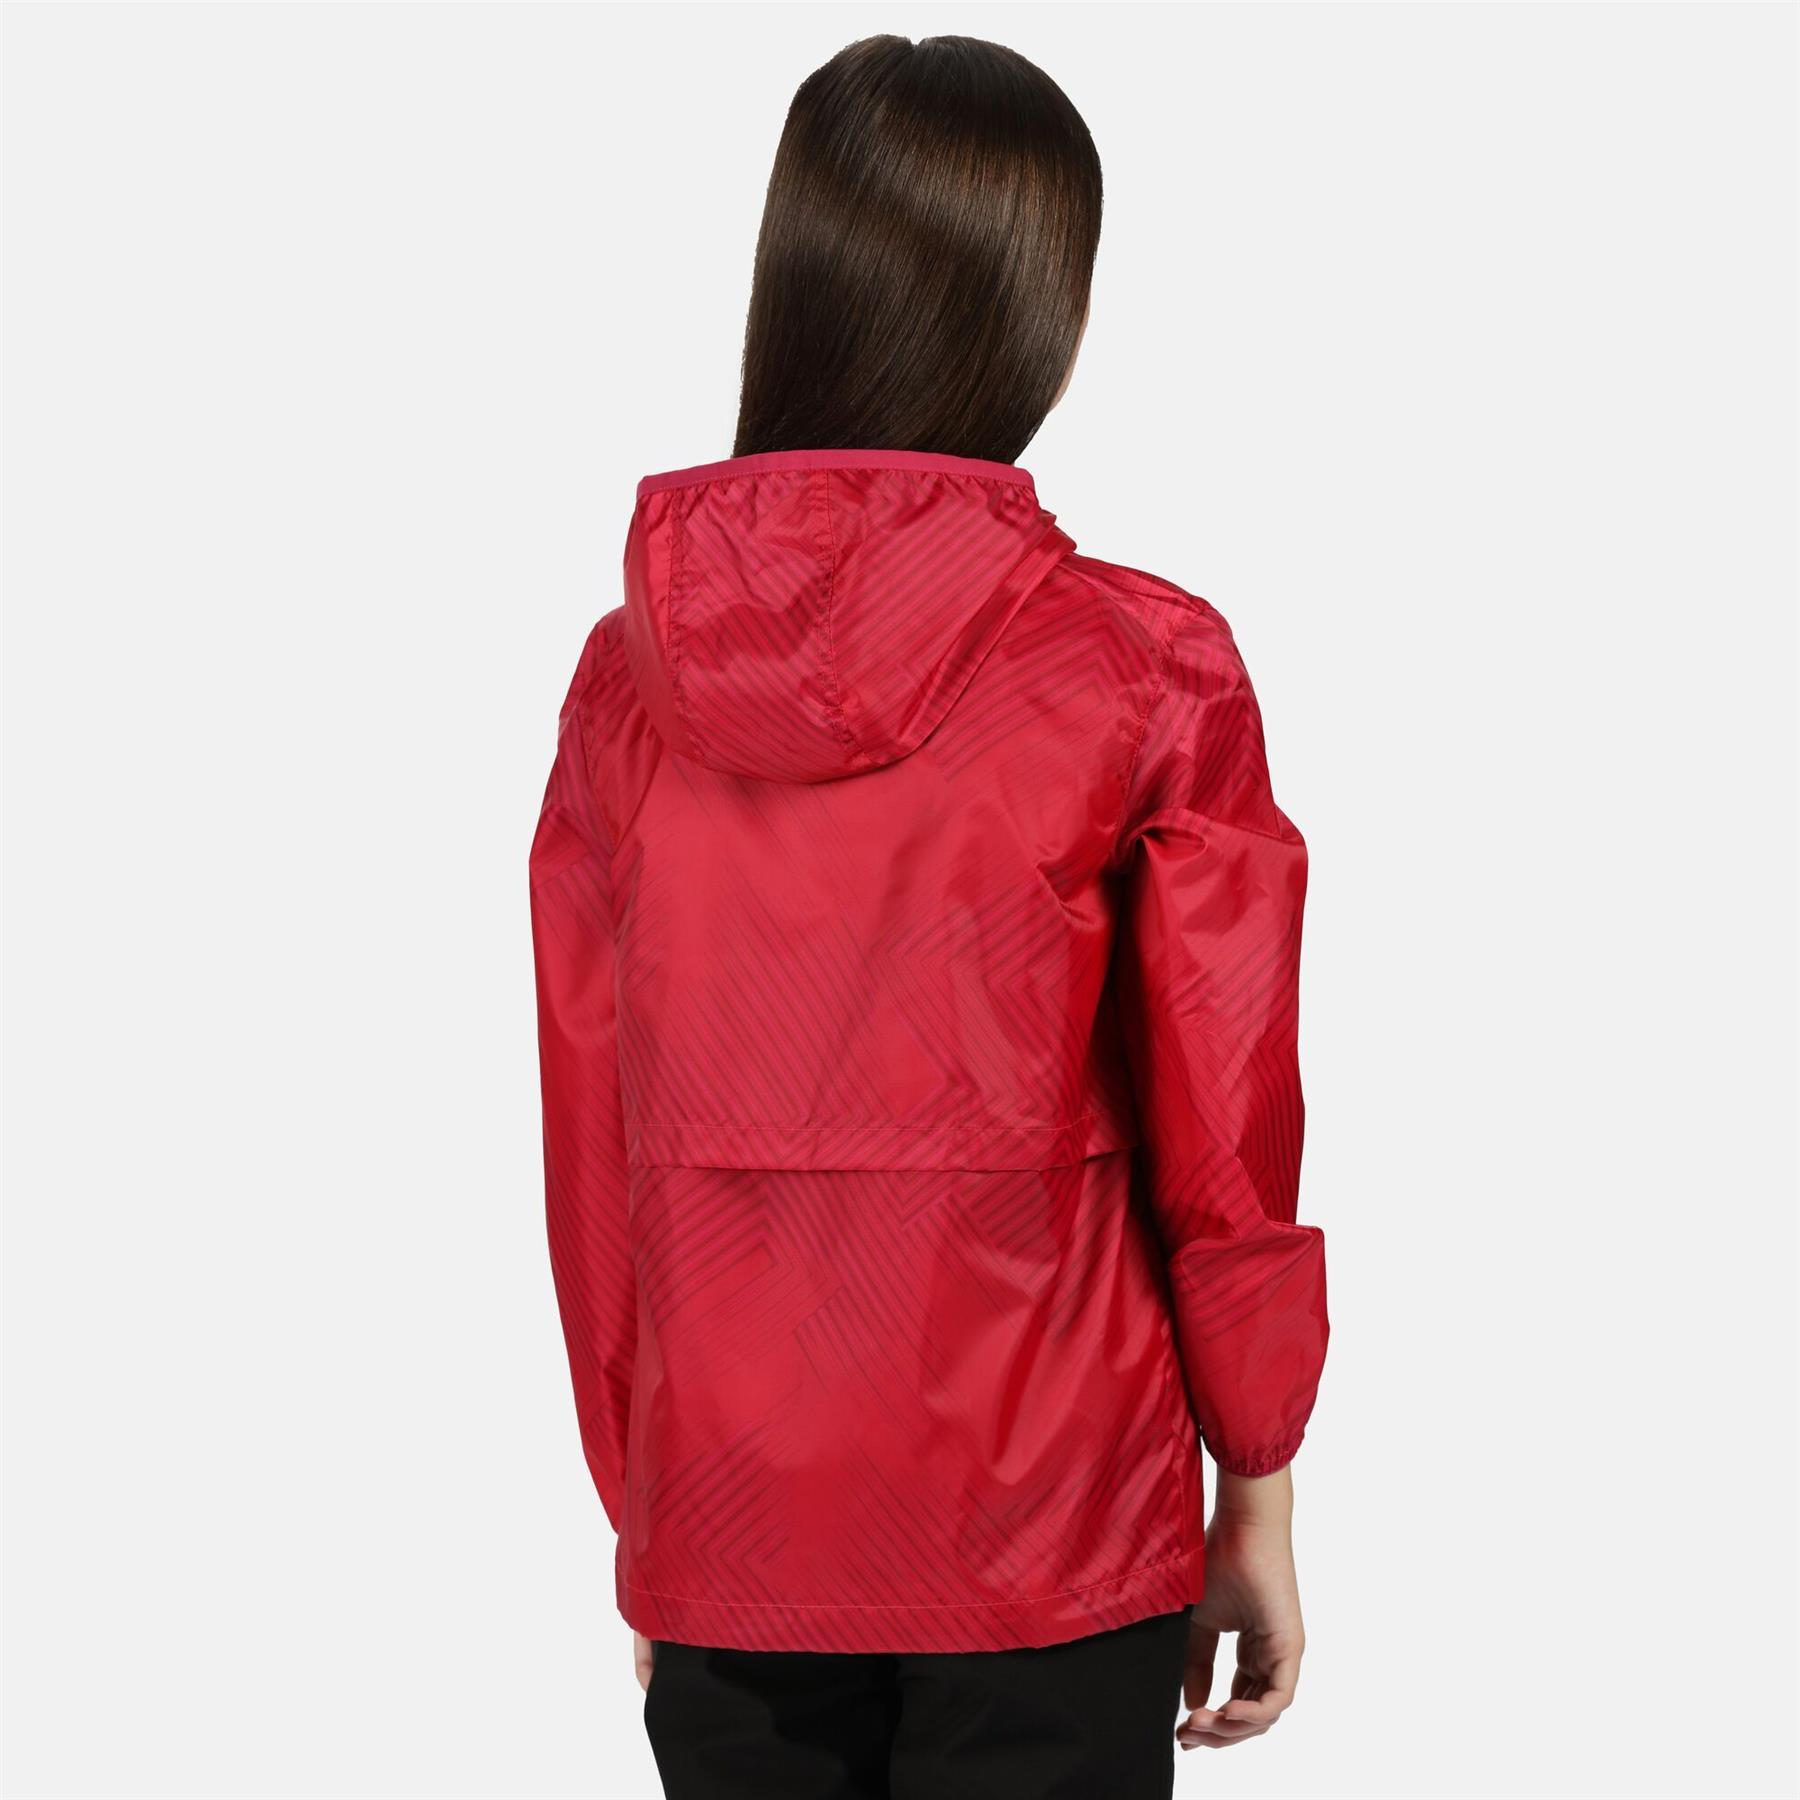 miniatuur 4 - Regatta Kids Bagley Waterproof Hooded Packable Jacket Boys Girls Rain Coat